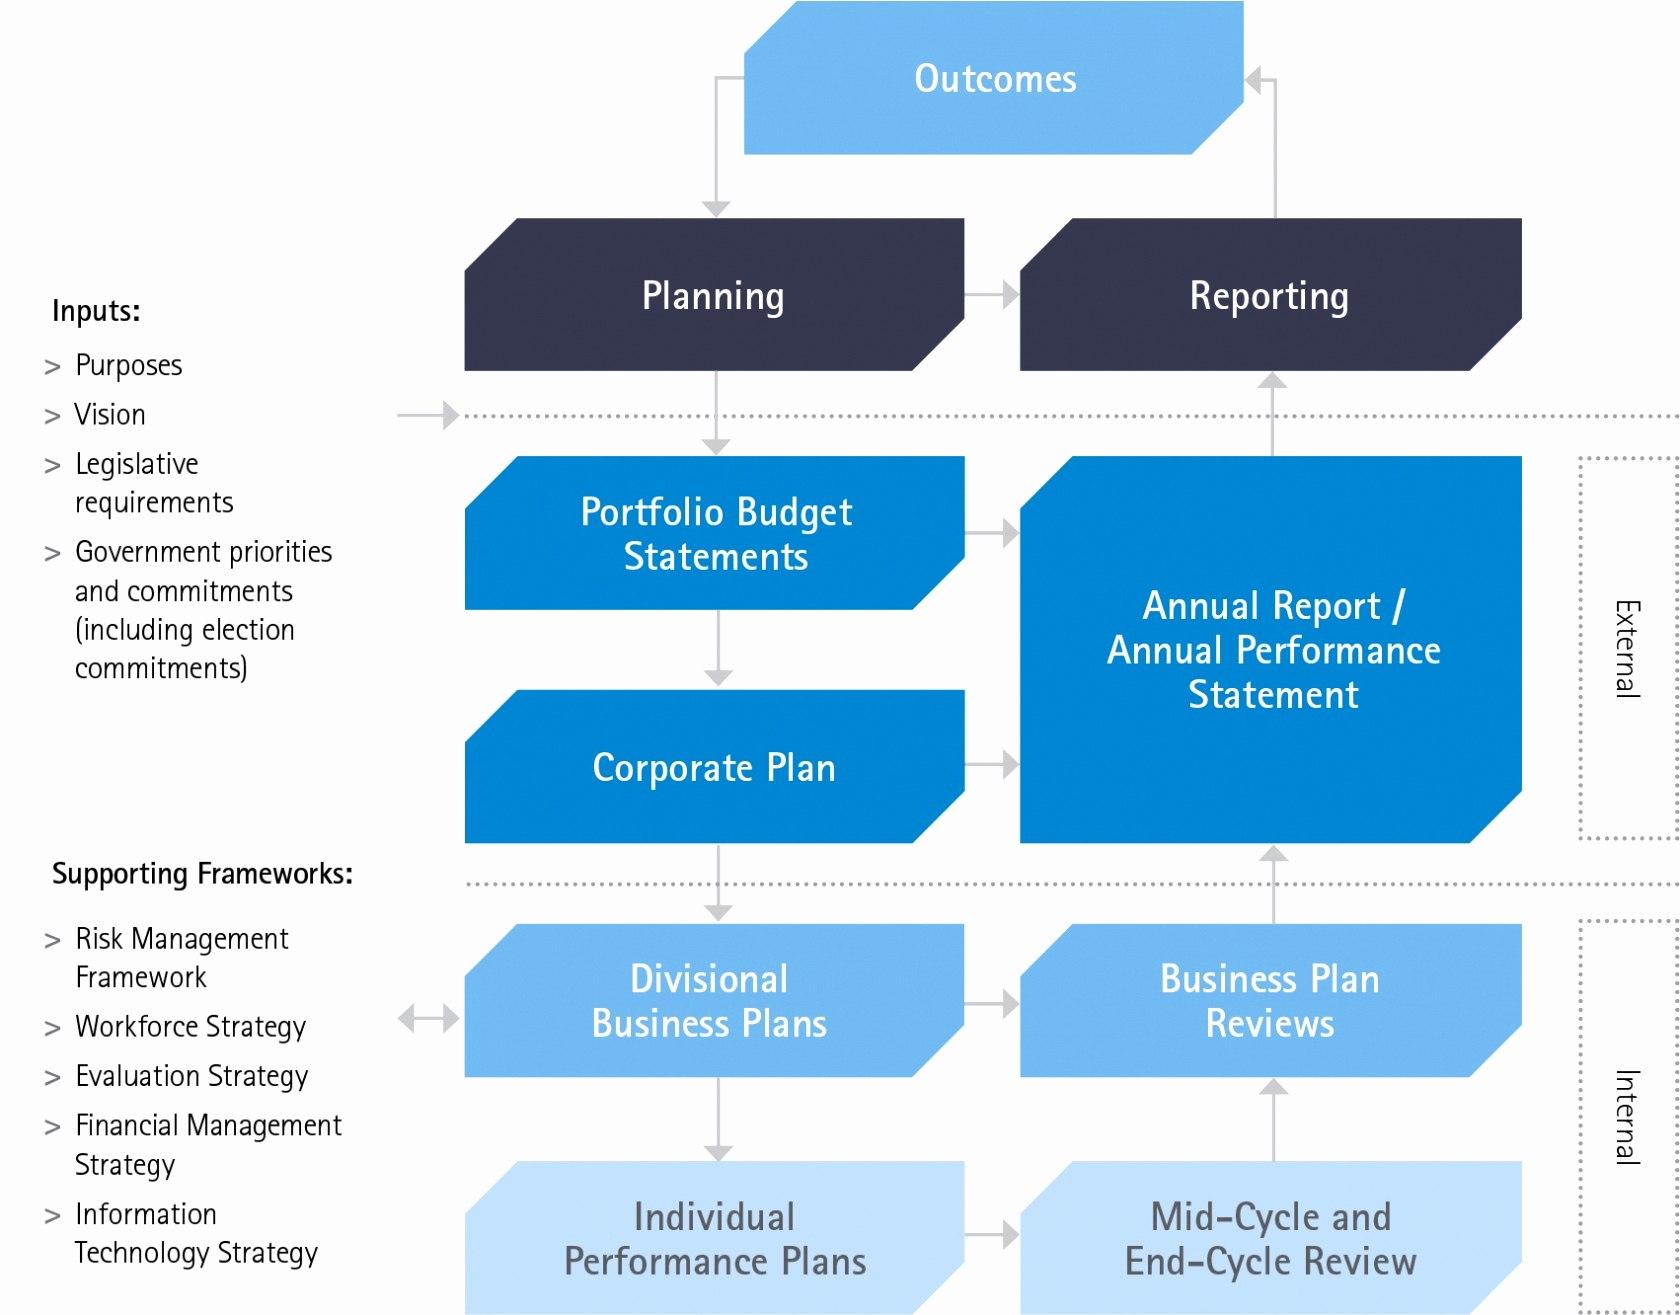 Plan Templates Business Framework Template Or Singular ~ Fanmailus Regarding Business Plan Framework Template